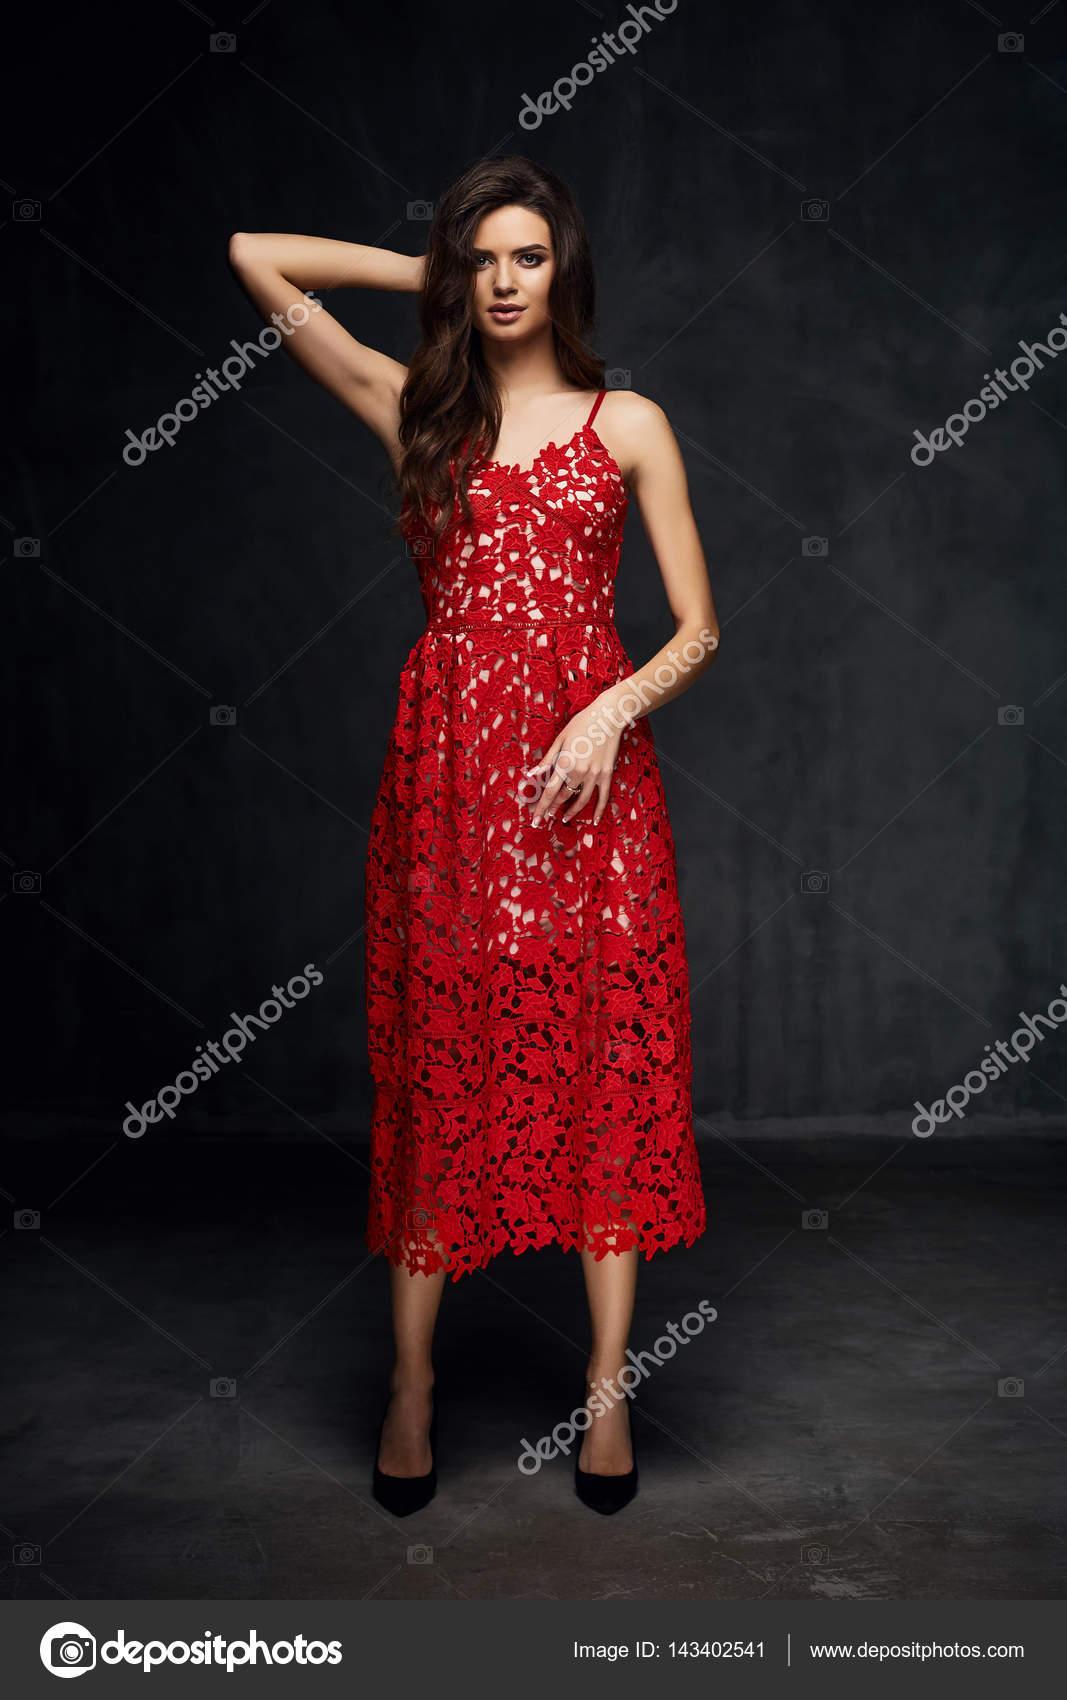 Hezká mladá sexy modelu žena s tmavými vlasy v úžasné červené krajkové šaty  a černé boty pózuje v tmavých studio– stock obrázky abcc9f5780